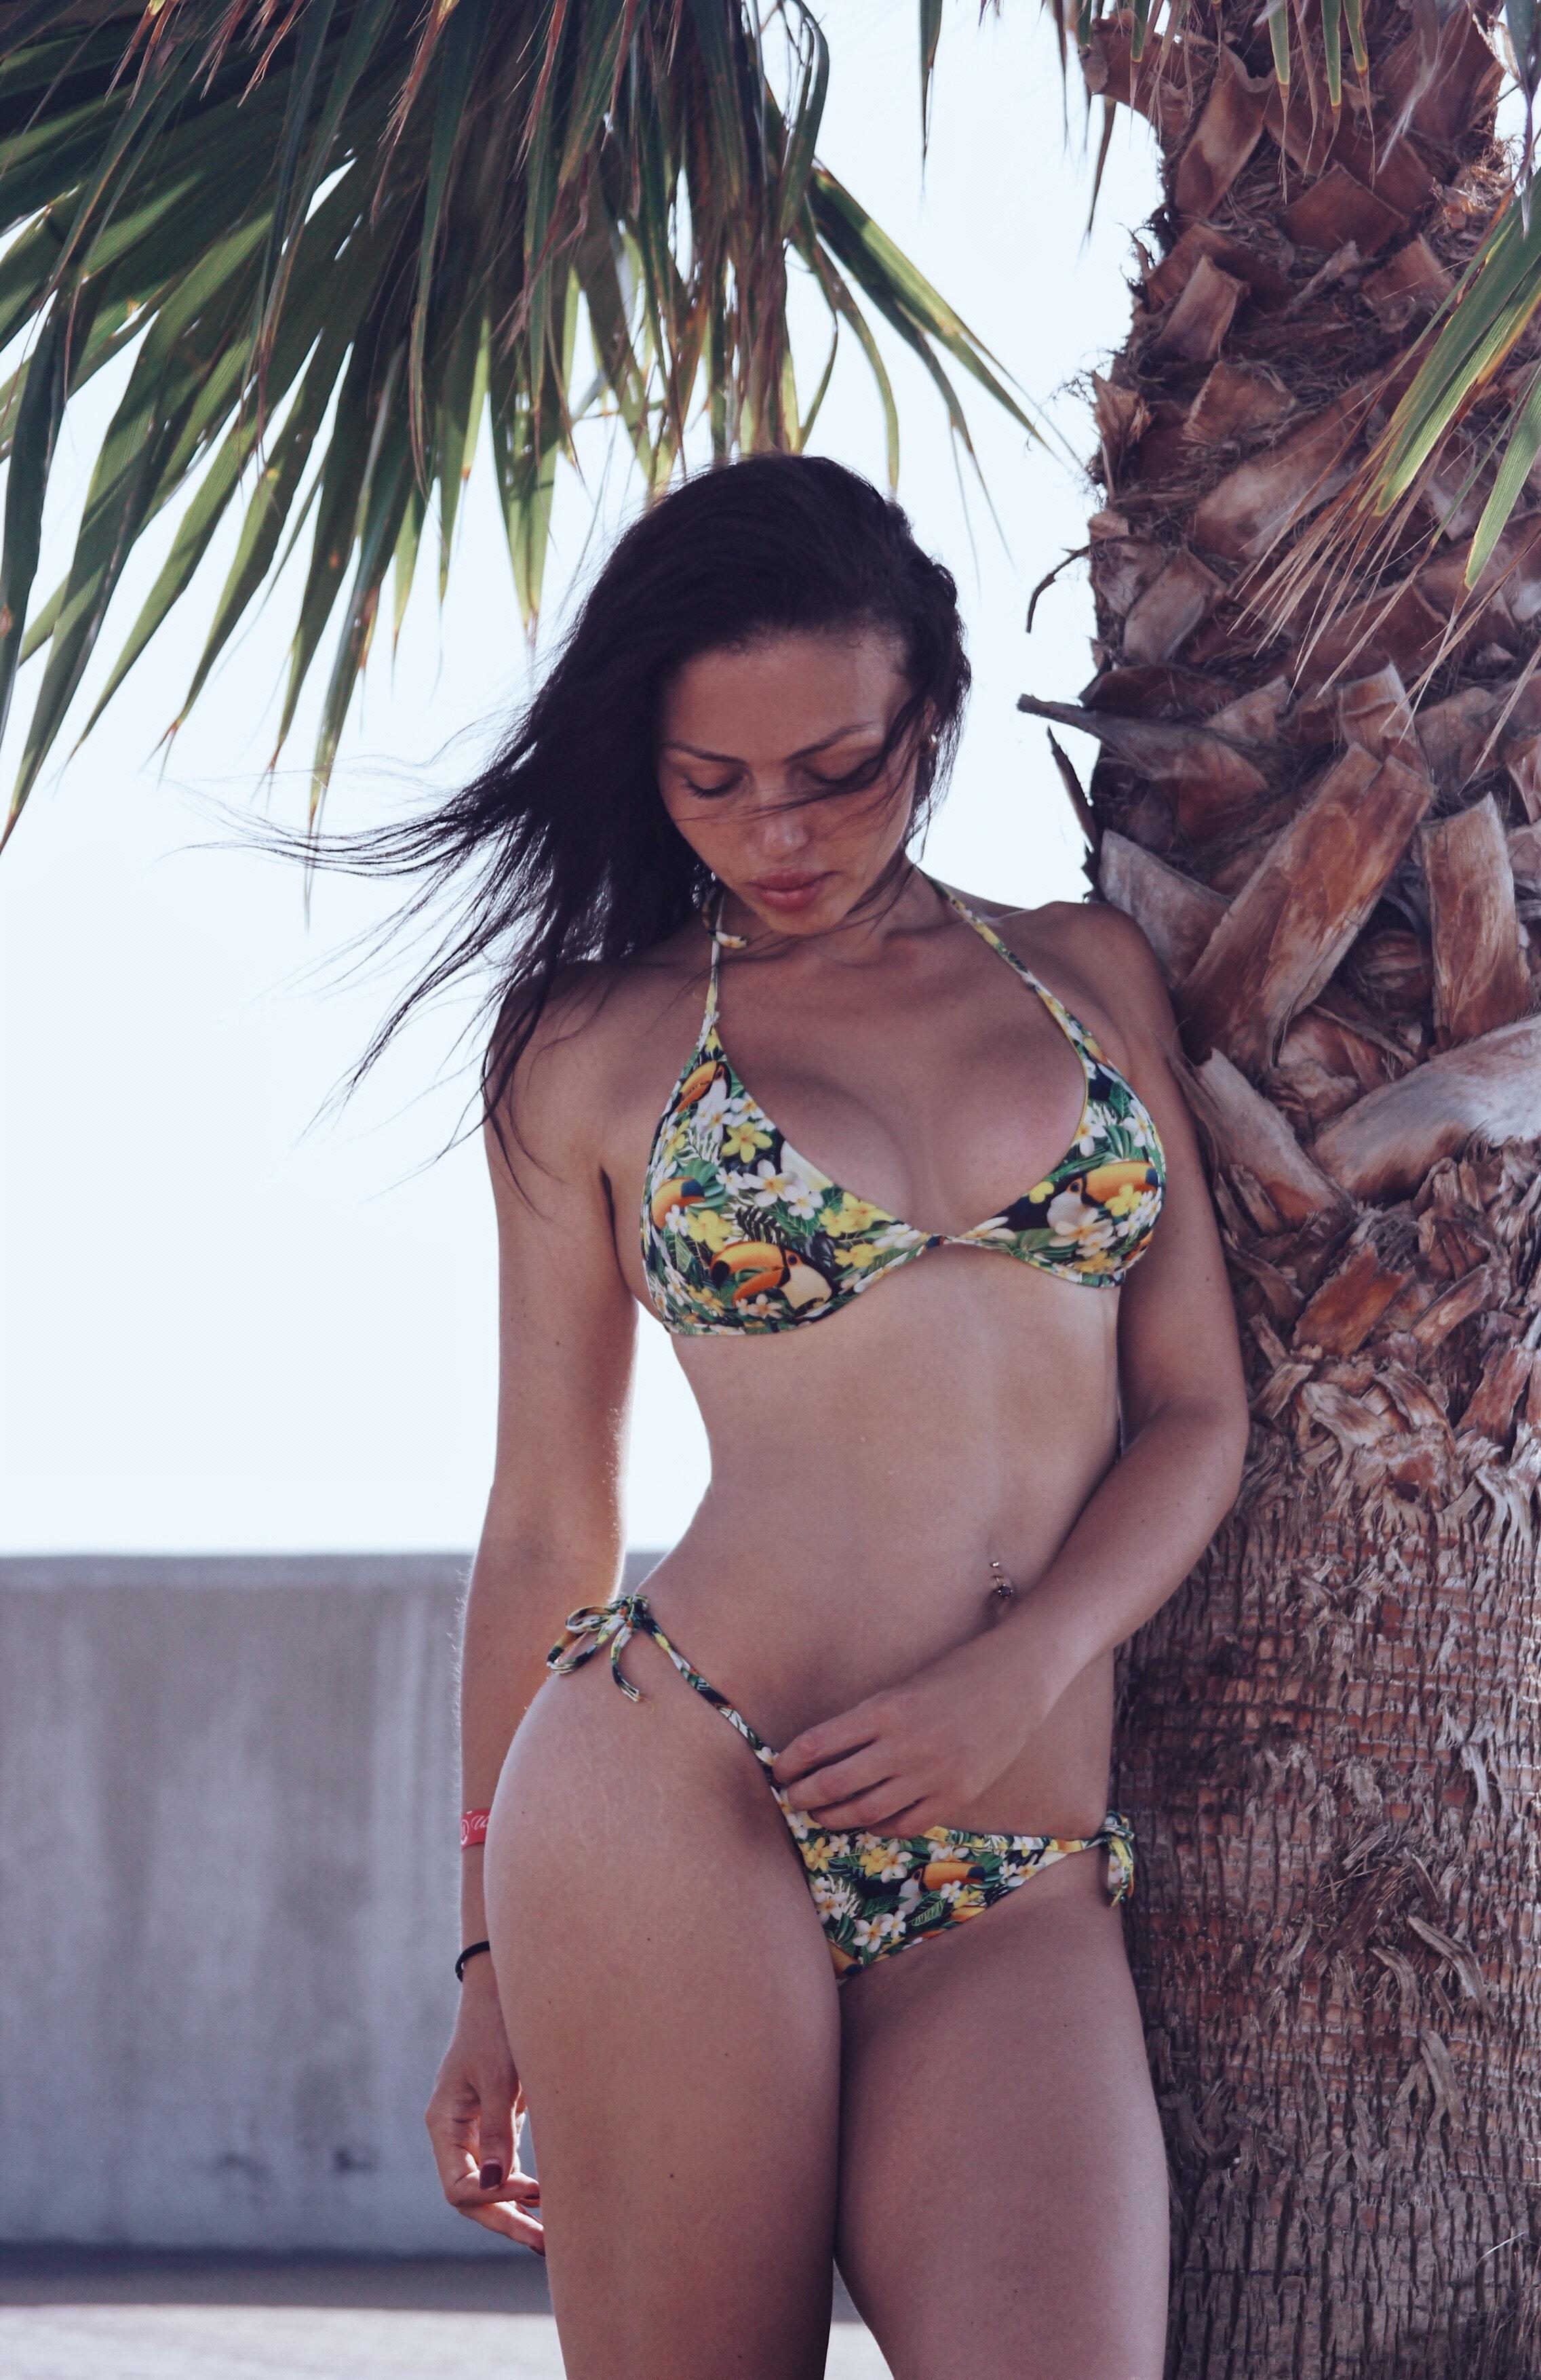 131aae31ad 250+ Beautiful Bikini Photos · Pexels · Free Stock Photos